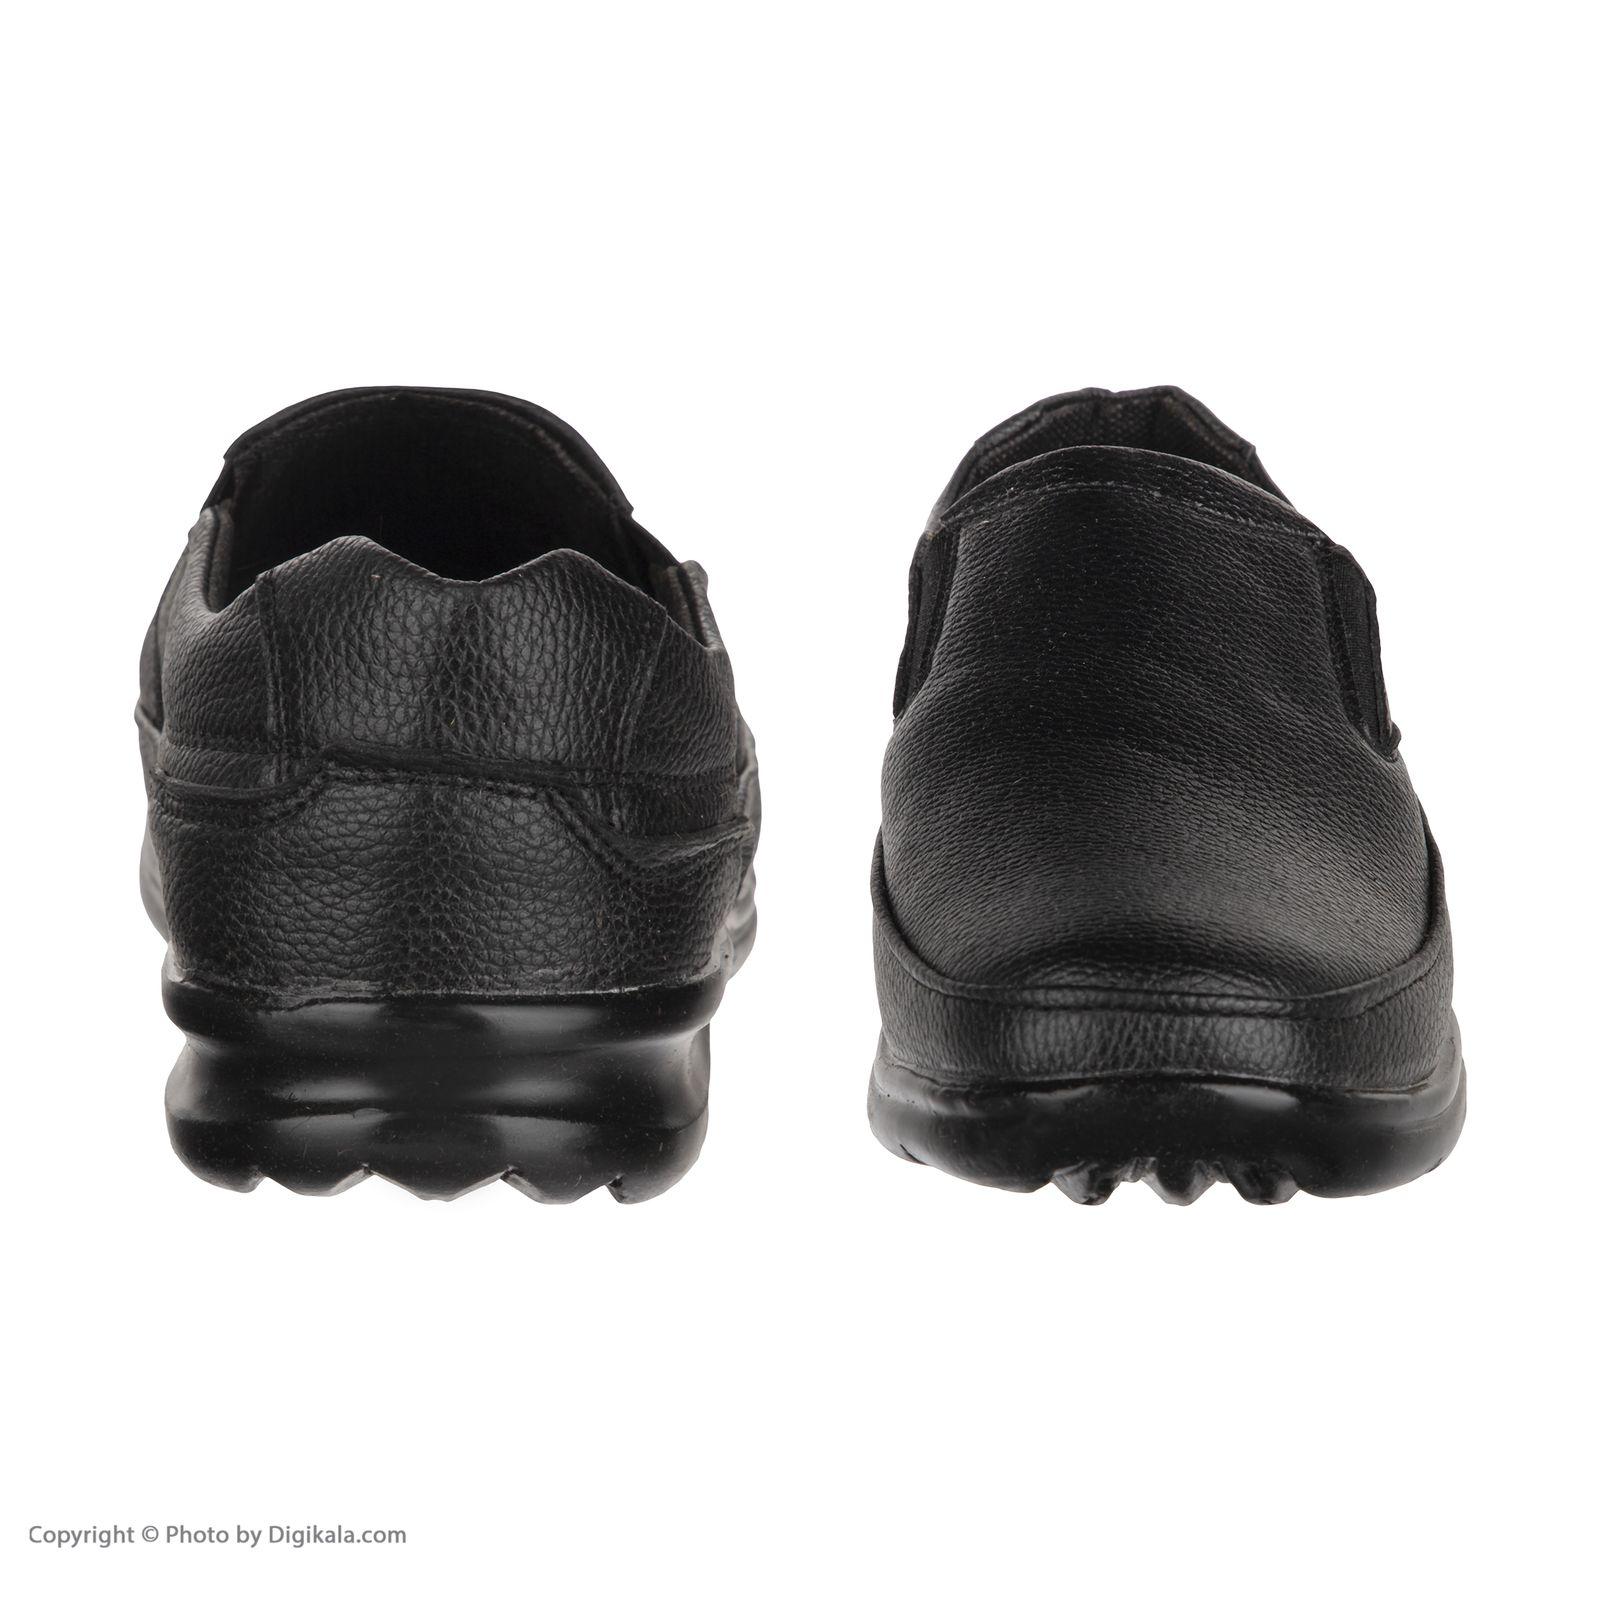 کفش روزمره مردانه مدل k.baz.074 -  - 4